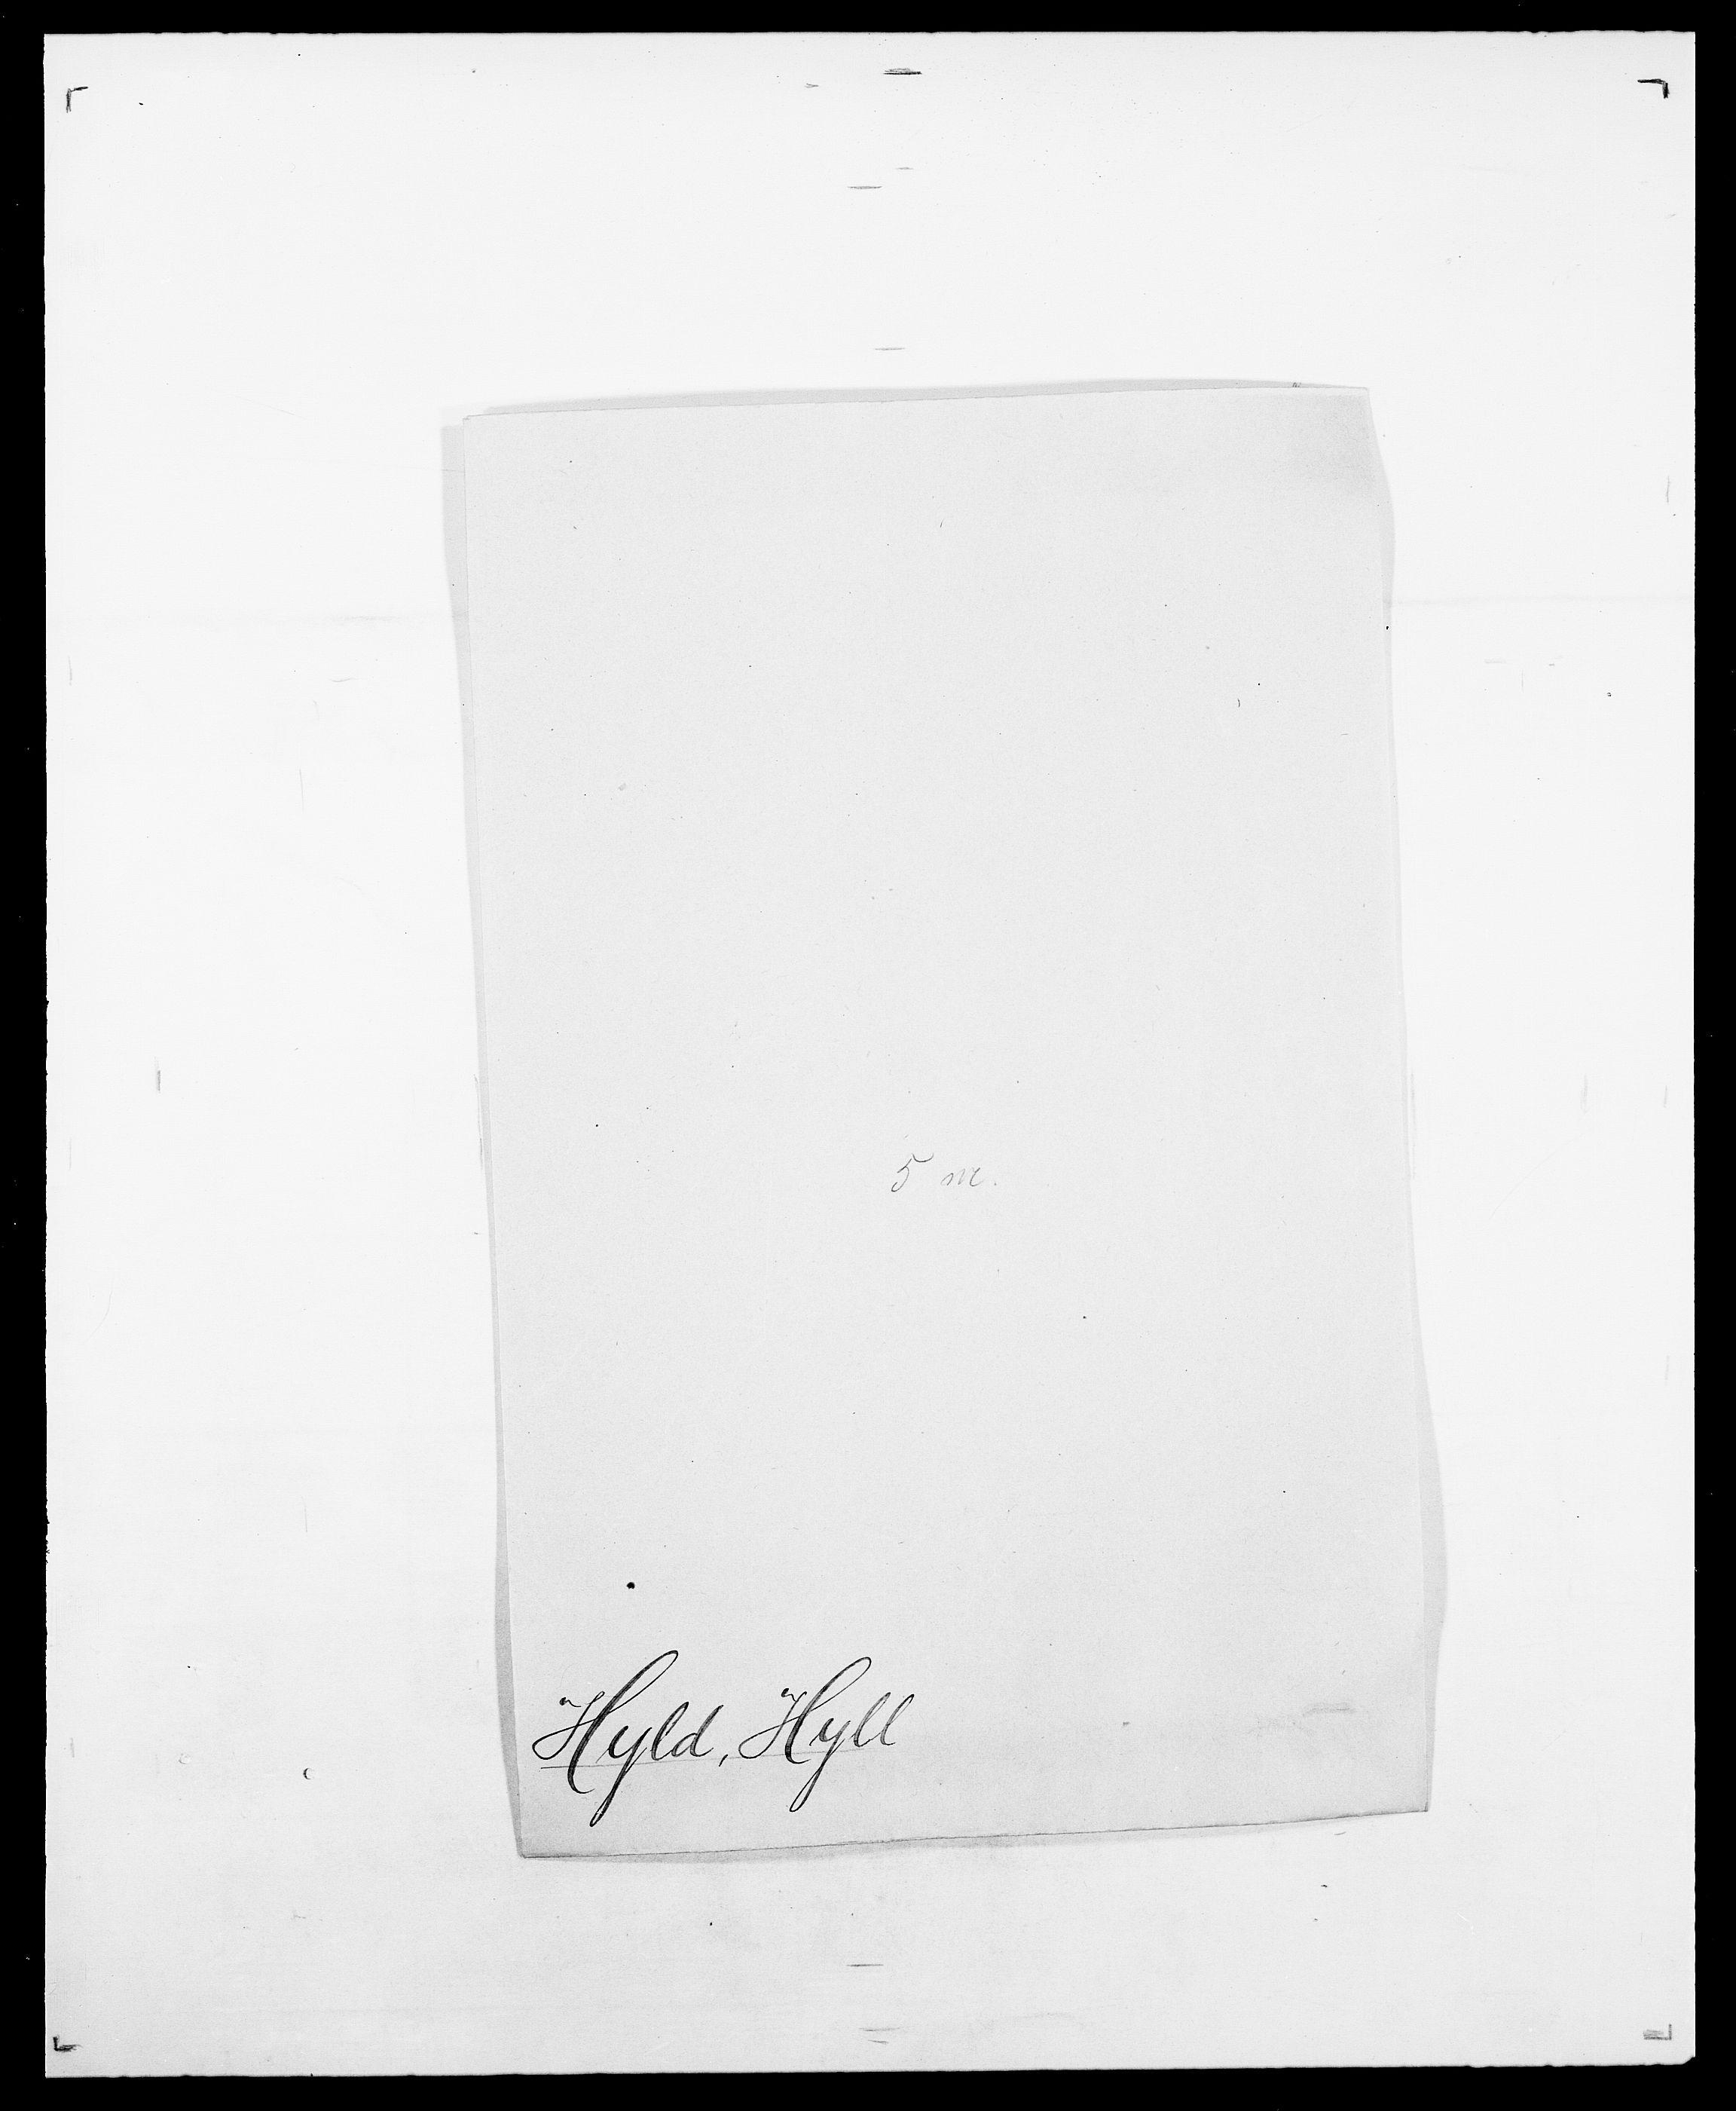 SAO, Delgobe, Charles Antoine - samling, D/Da/L0019: van der Hude - Joys, s. 264